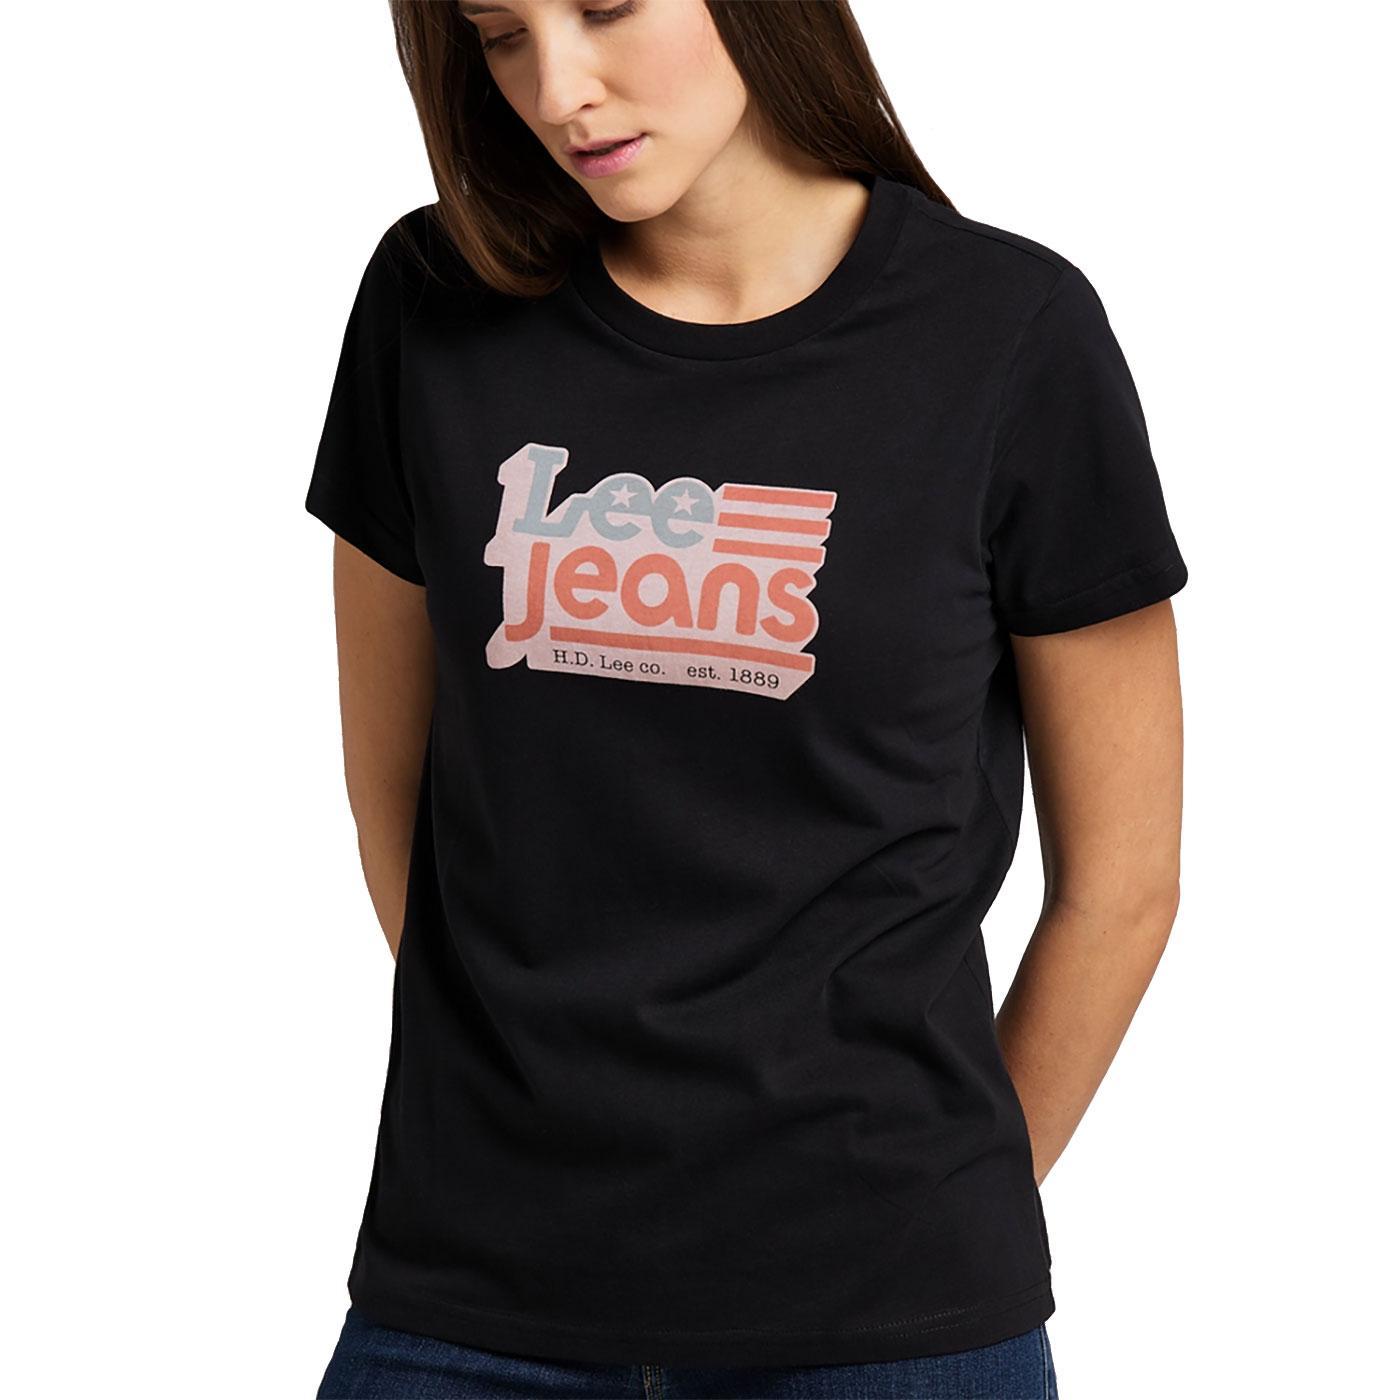 LEE JEANS Womens Retro American Logo Crew Tee